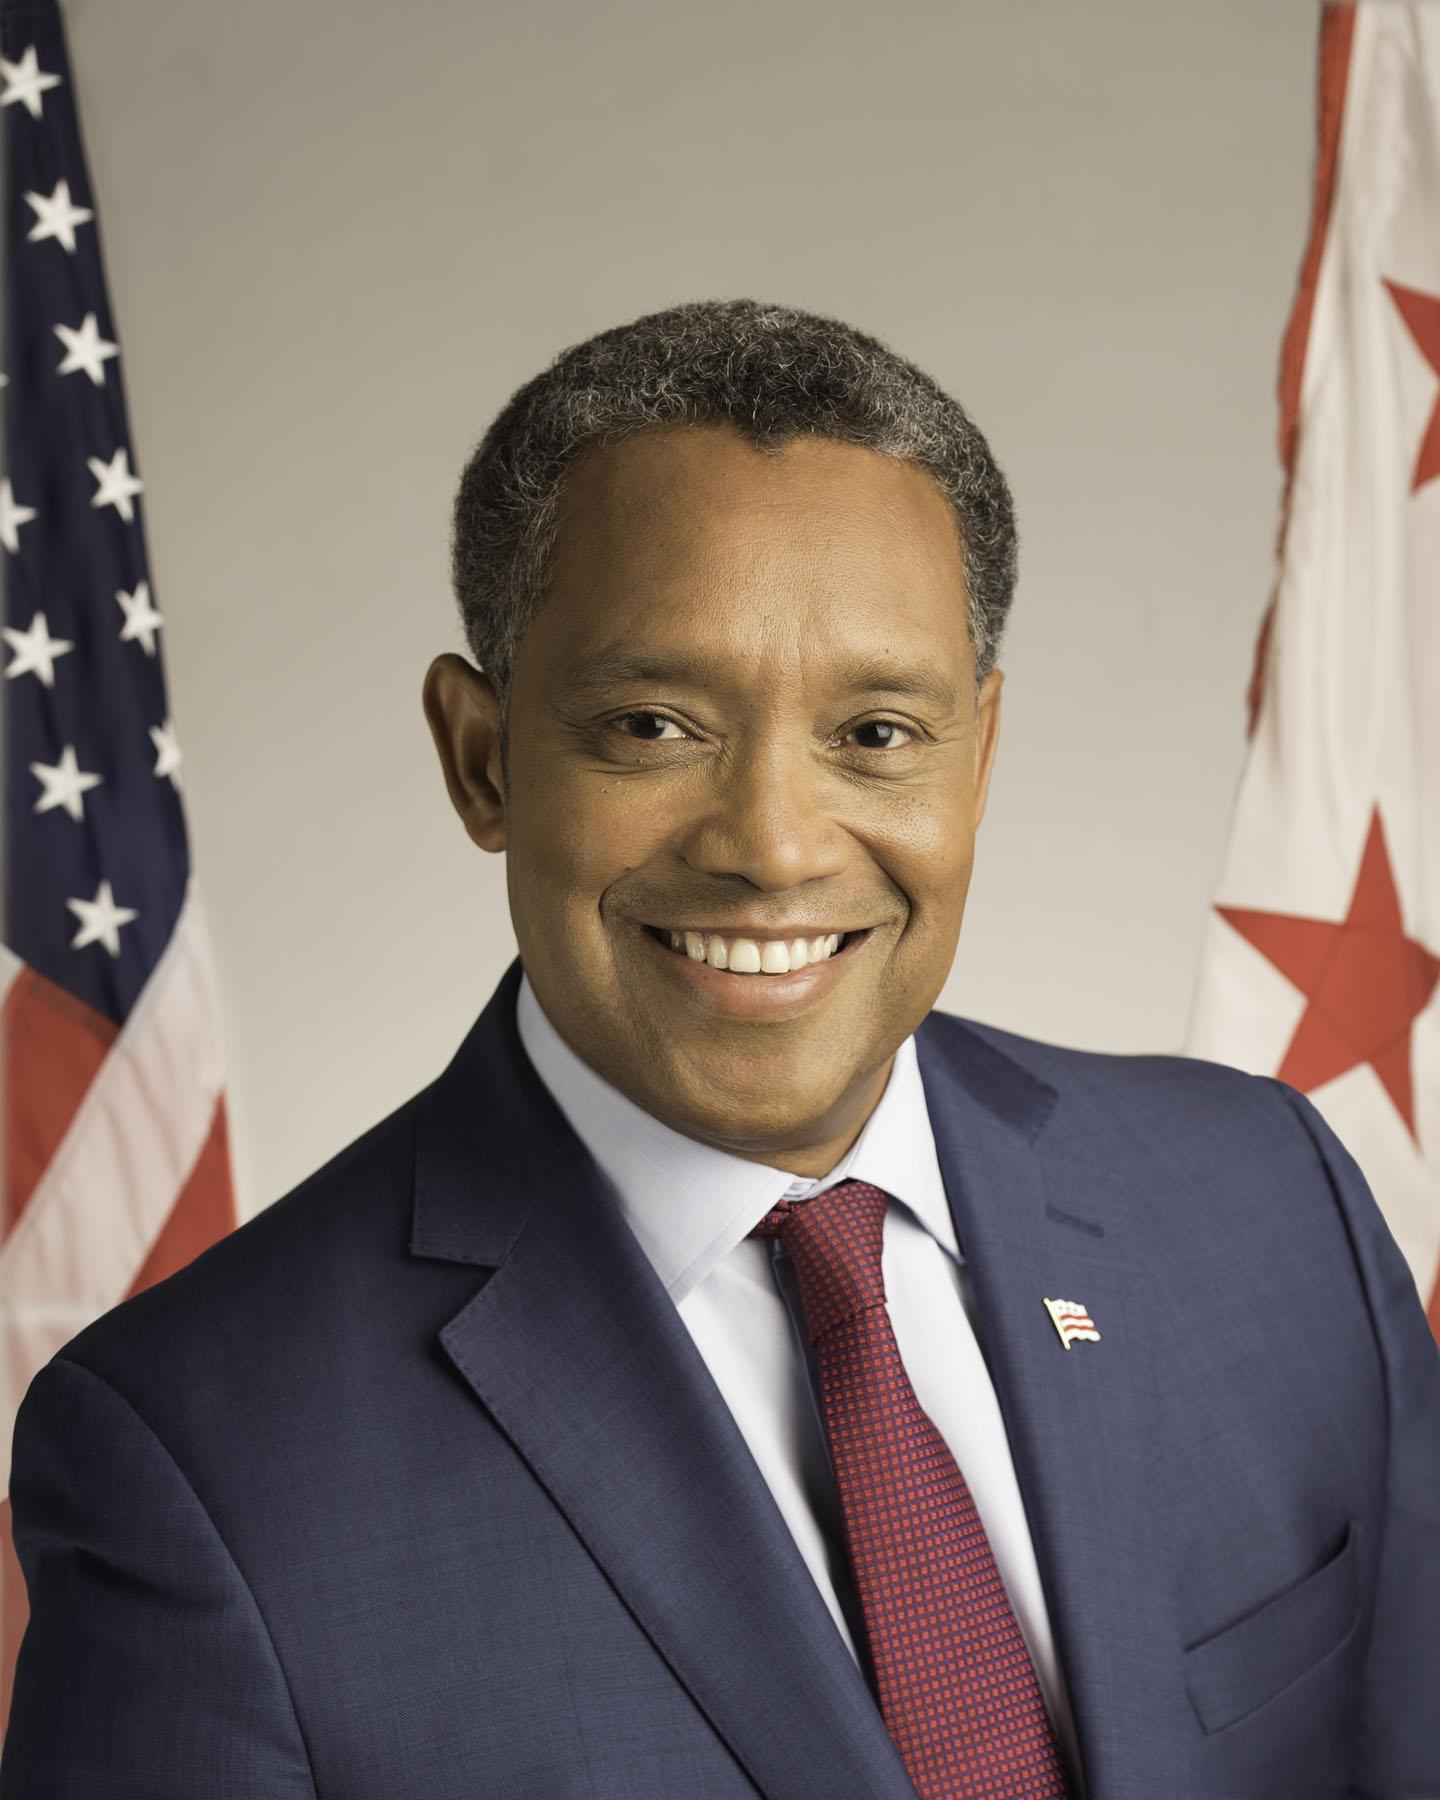 Attorney General Karl Racine